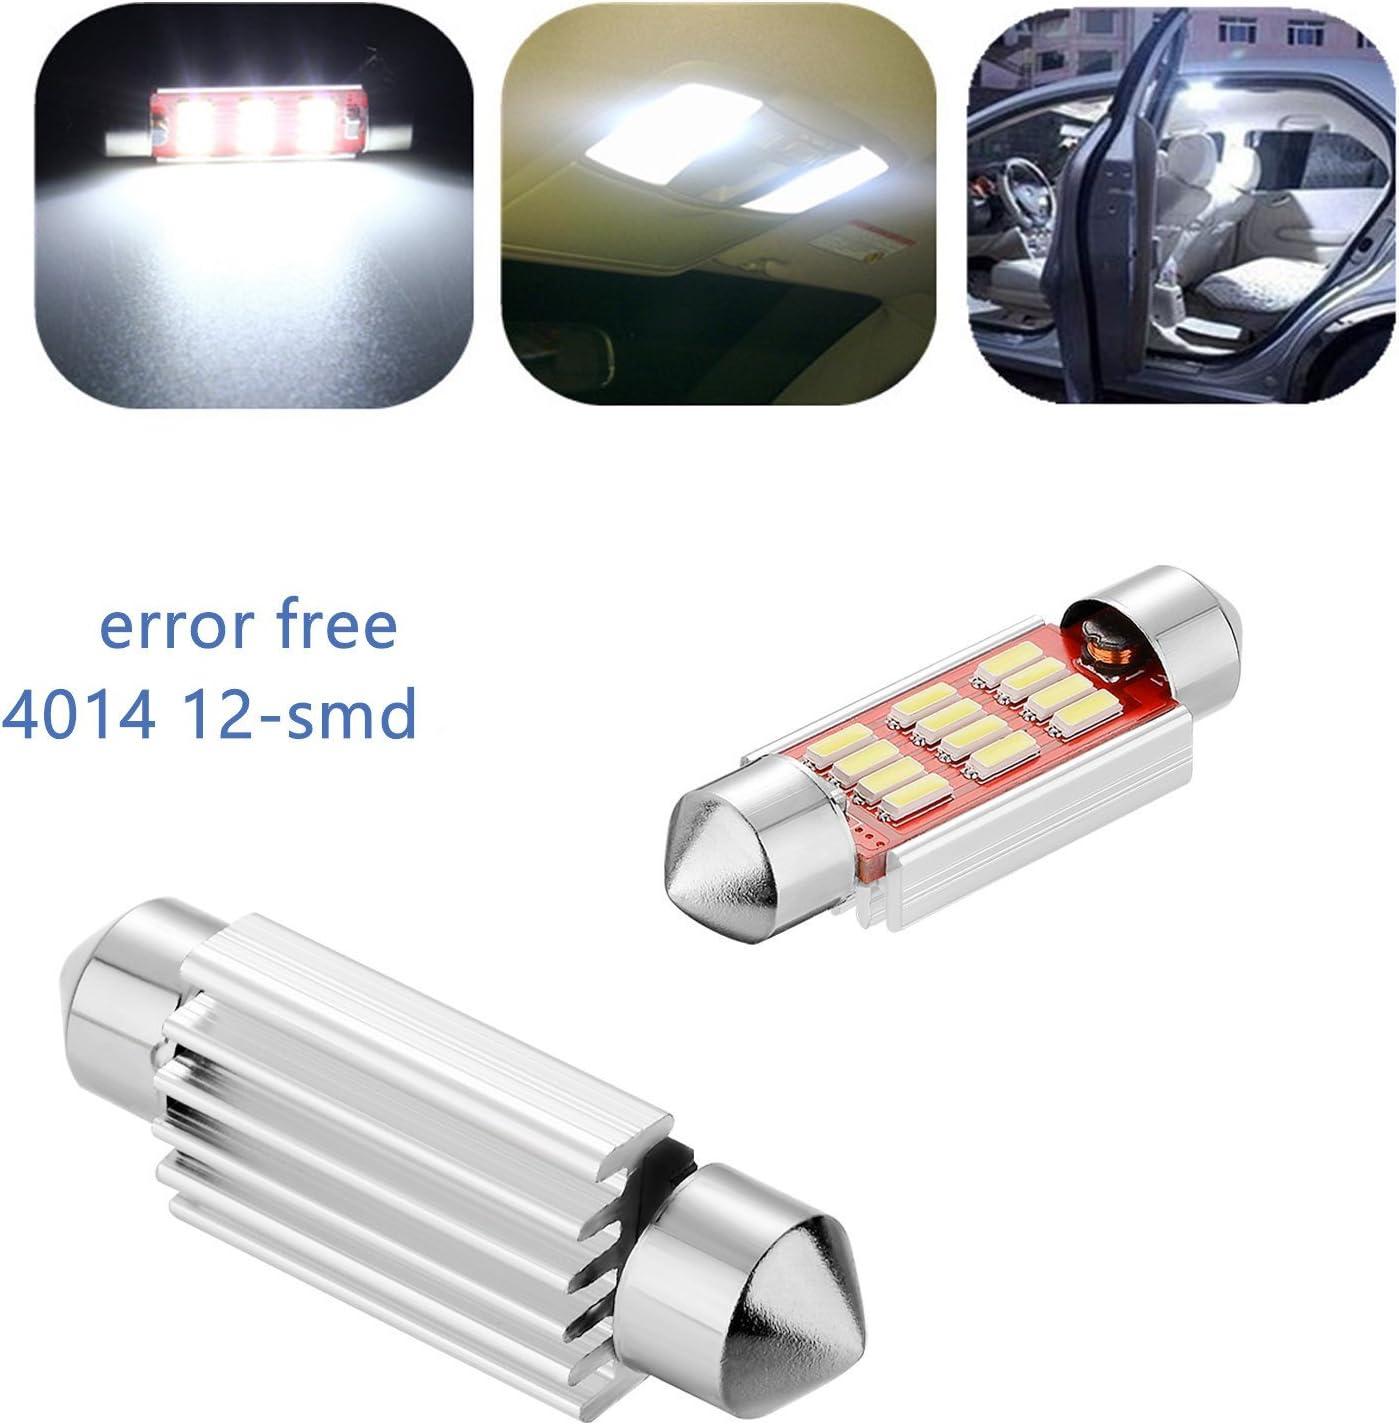 de Haichen /41/mm libre de errores fest/ón de lectura 36/ de c/úpula luz de matr/ícula blancas 4014/Canbus Pack de 4/luces para coche de LED